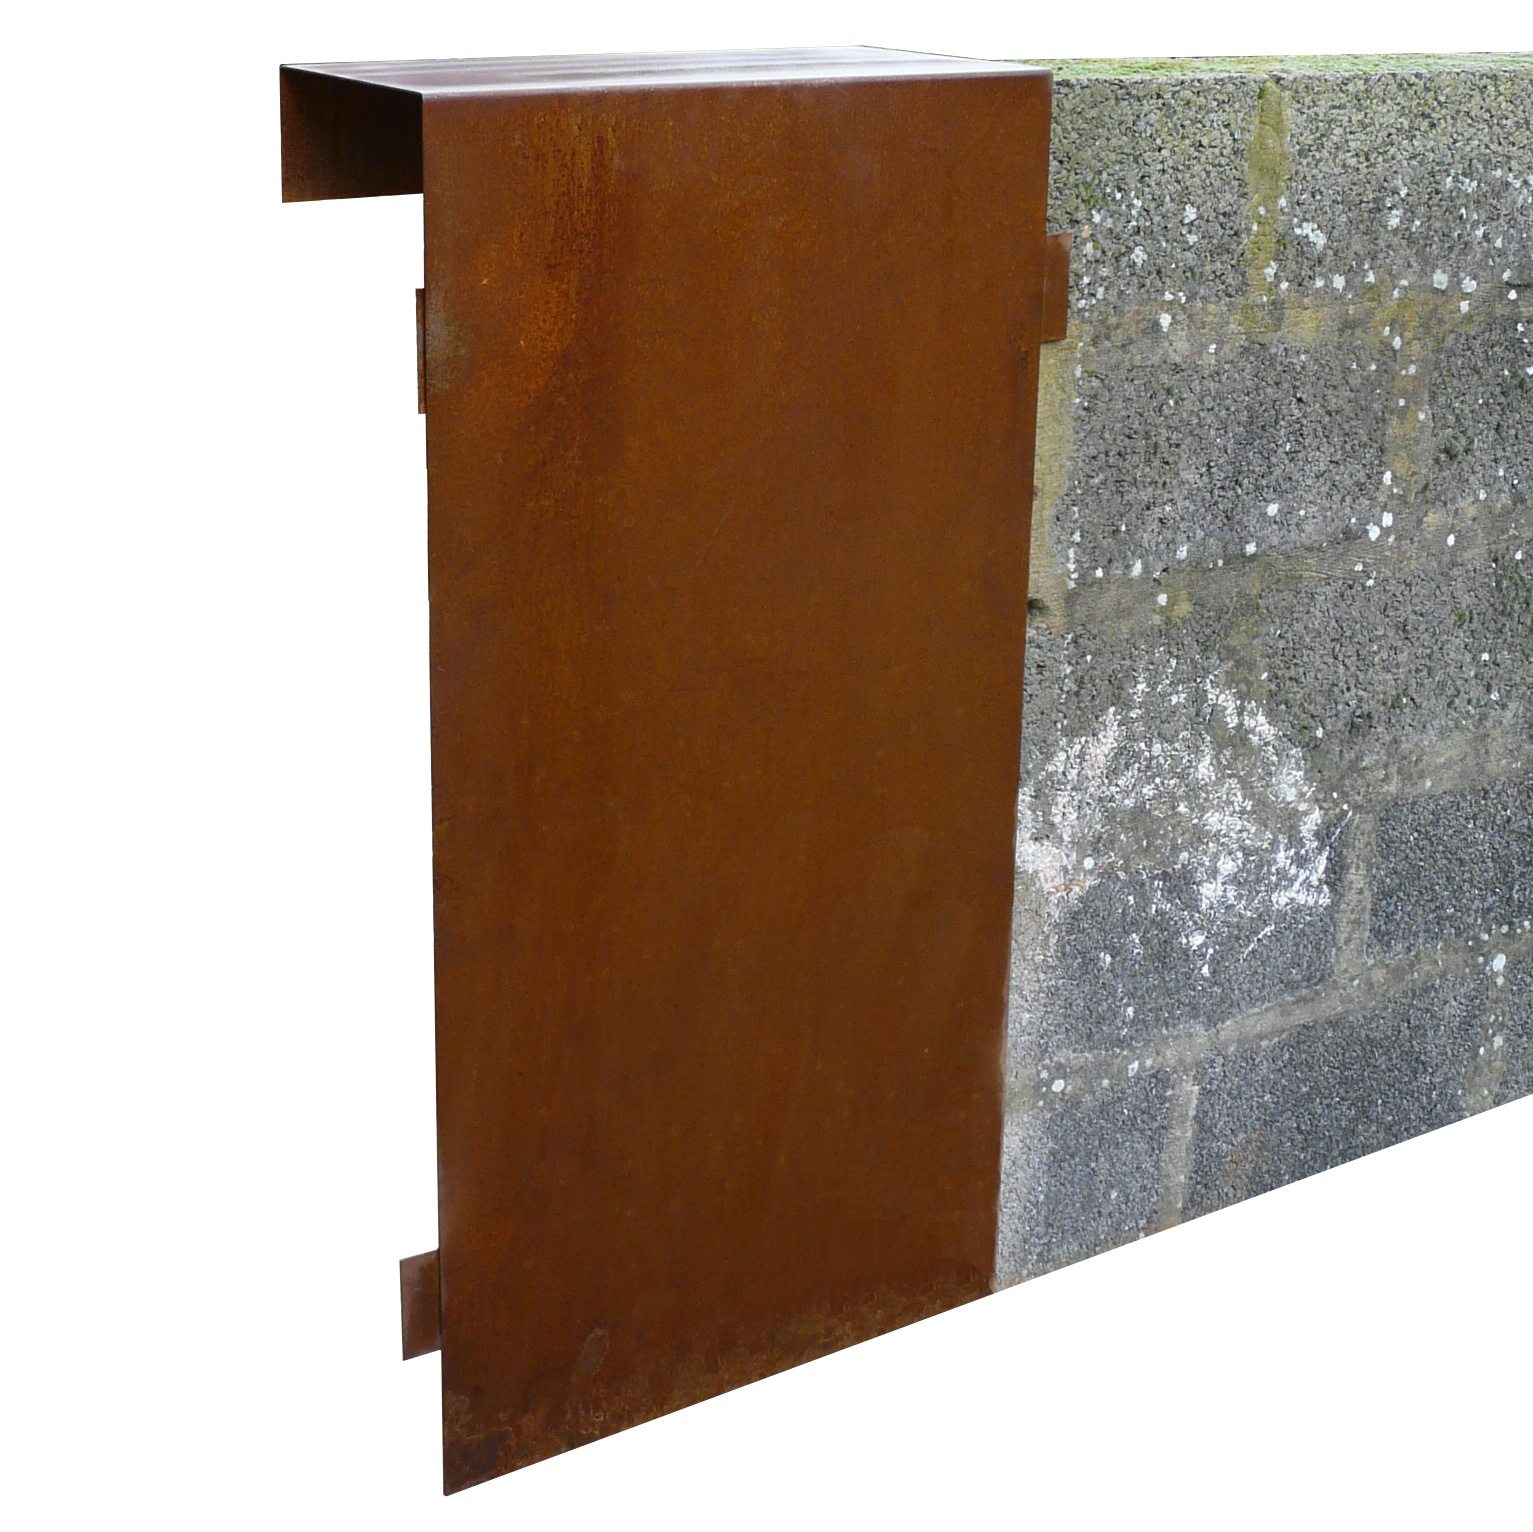 couvre murs bordures tole archives. Black Bedroom Furniture Sets. Home Design Ideas